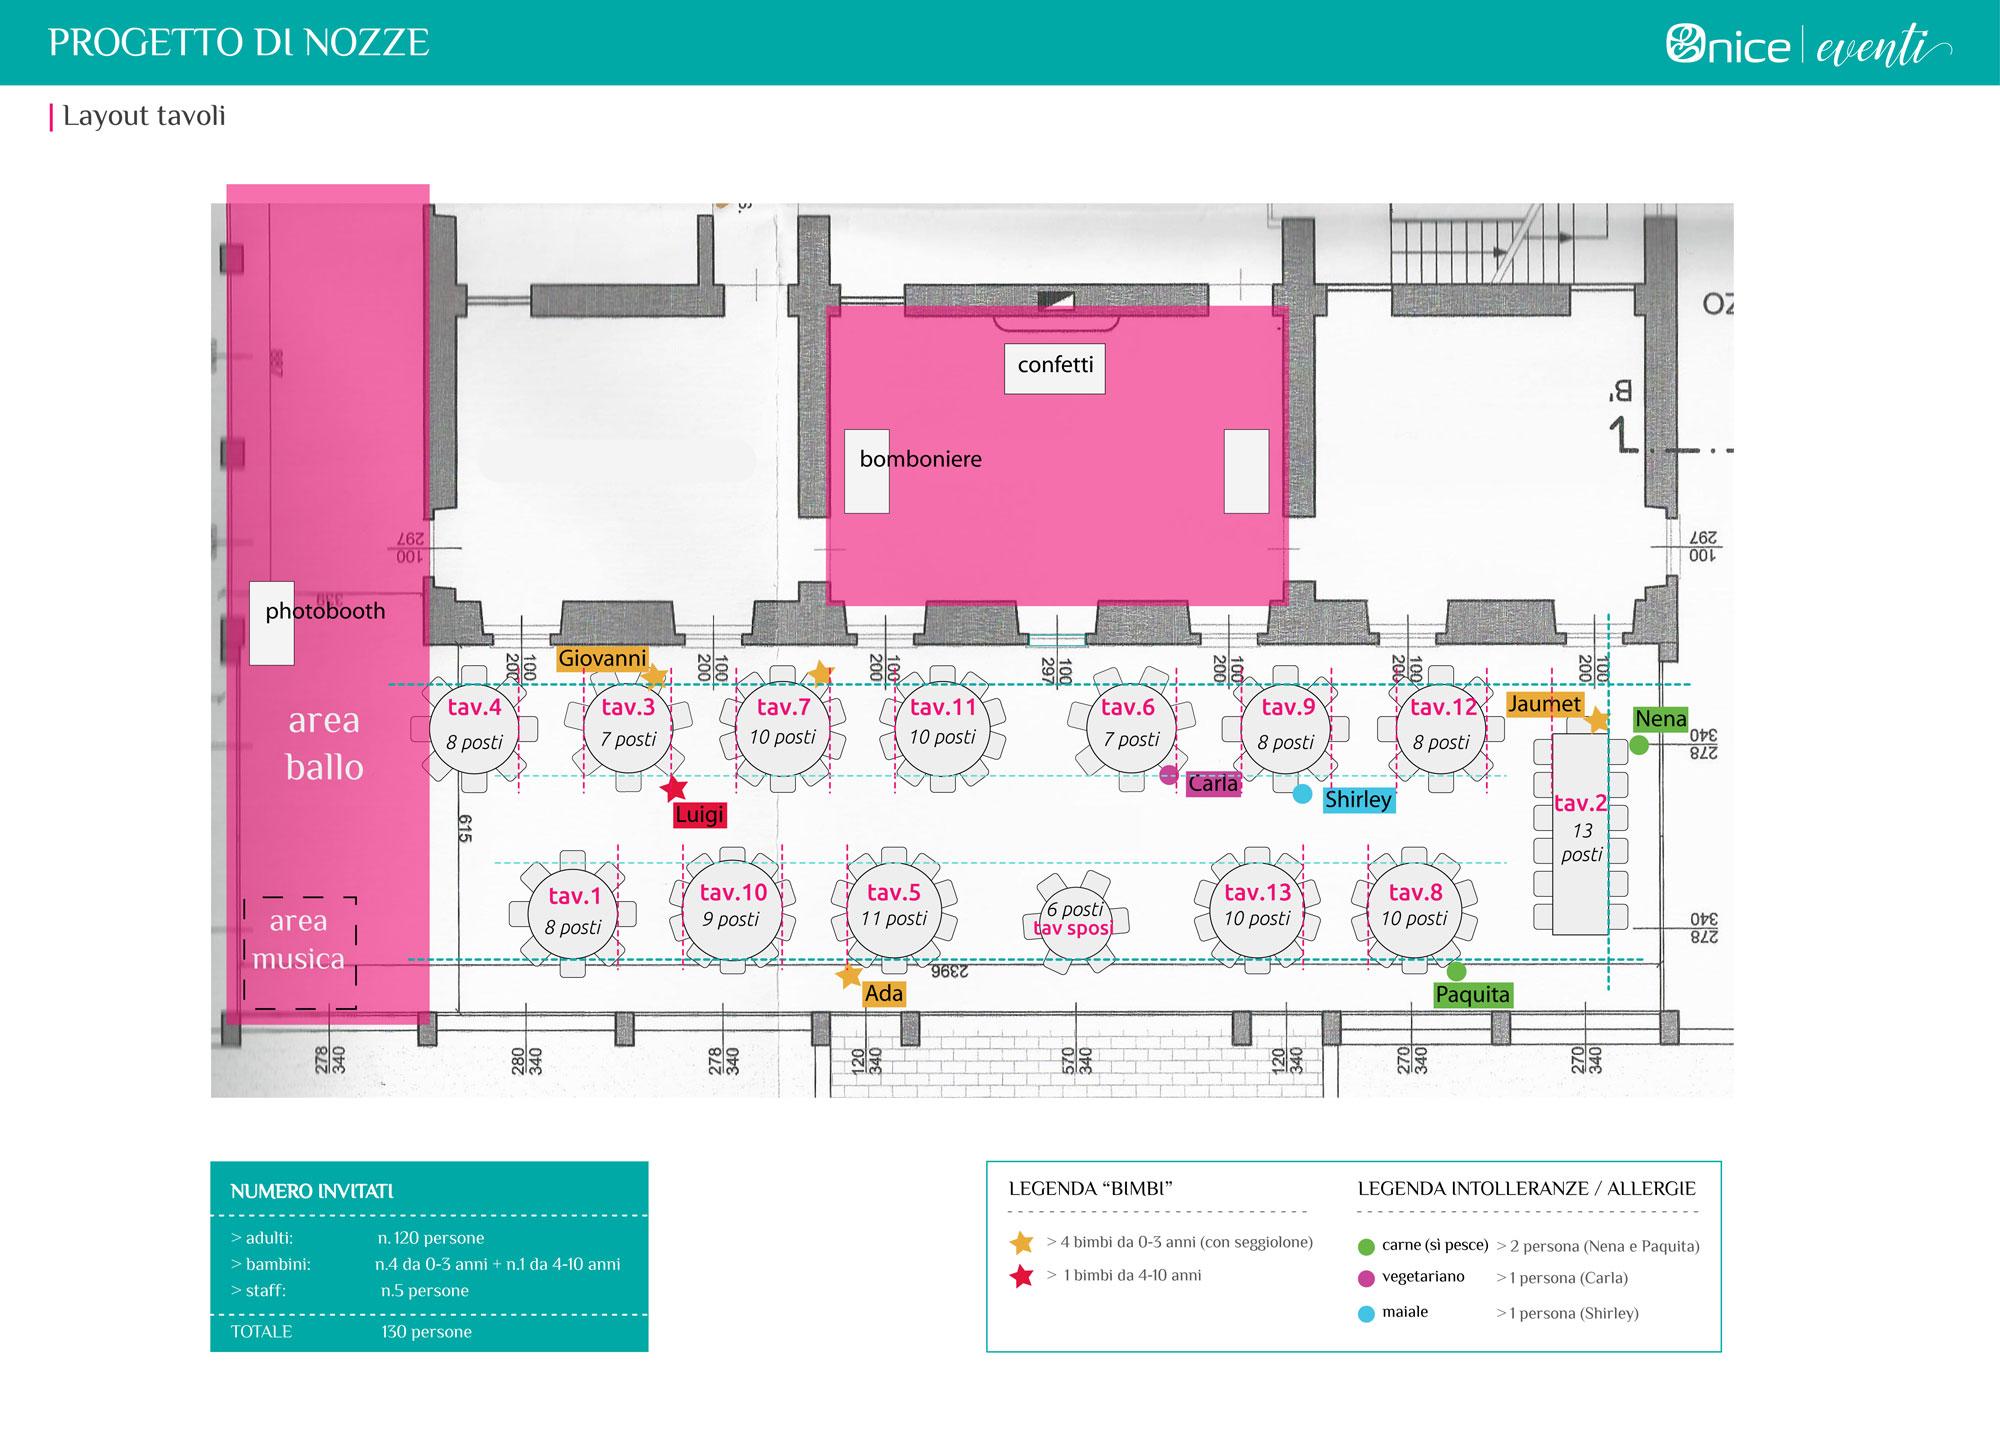 Onice Eventi - planimetria sala ricevimento di nozze con layout tavoli